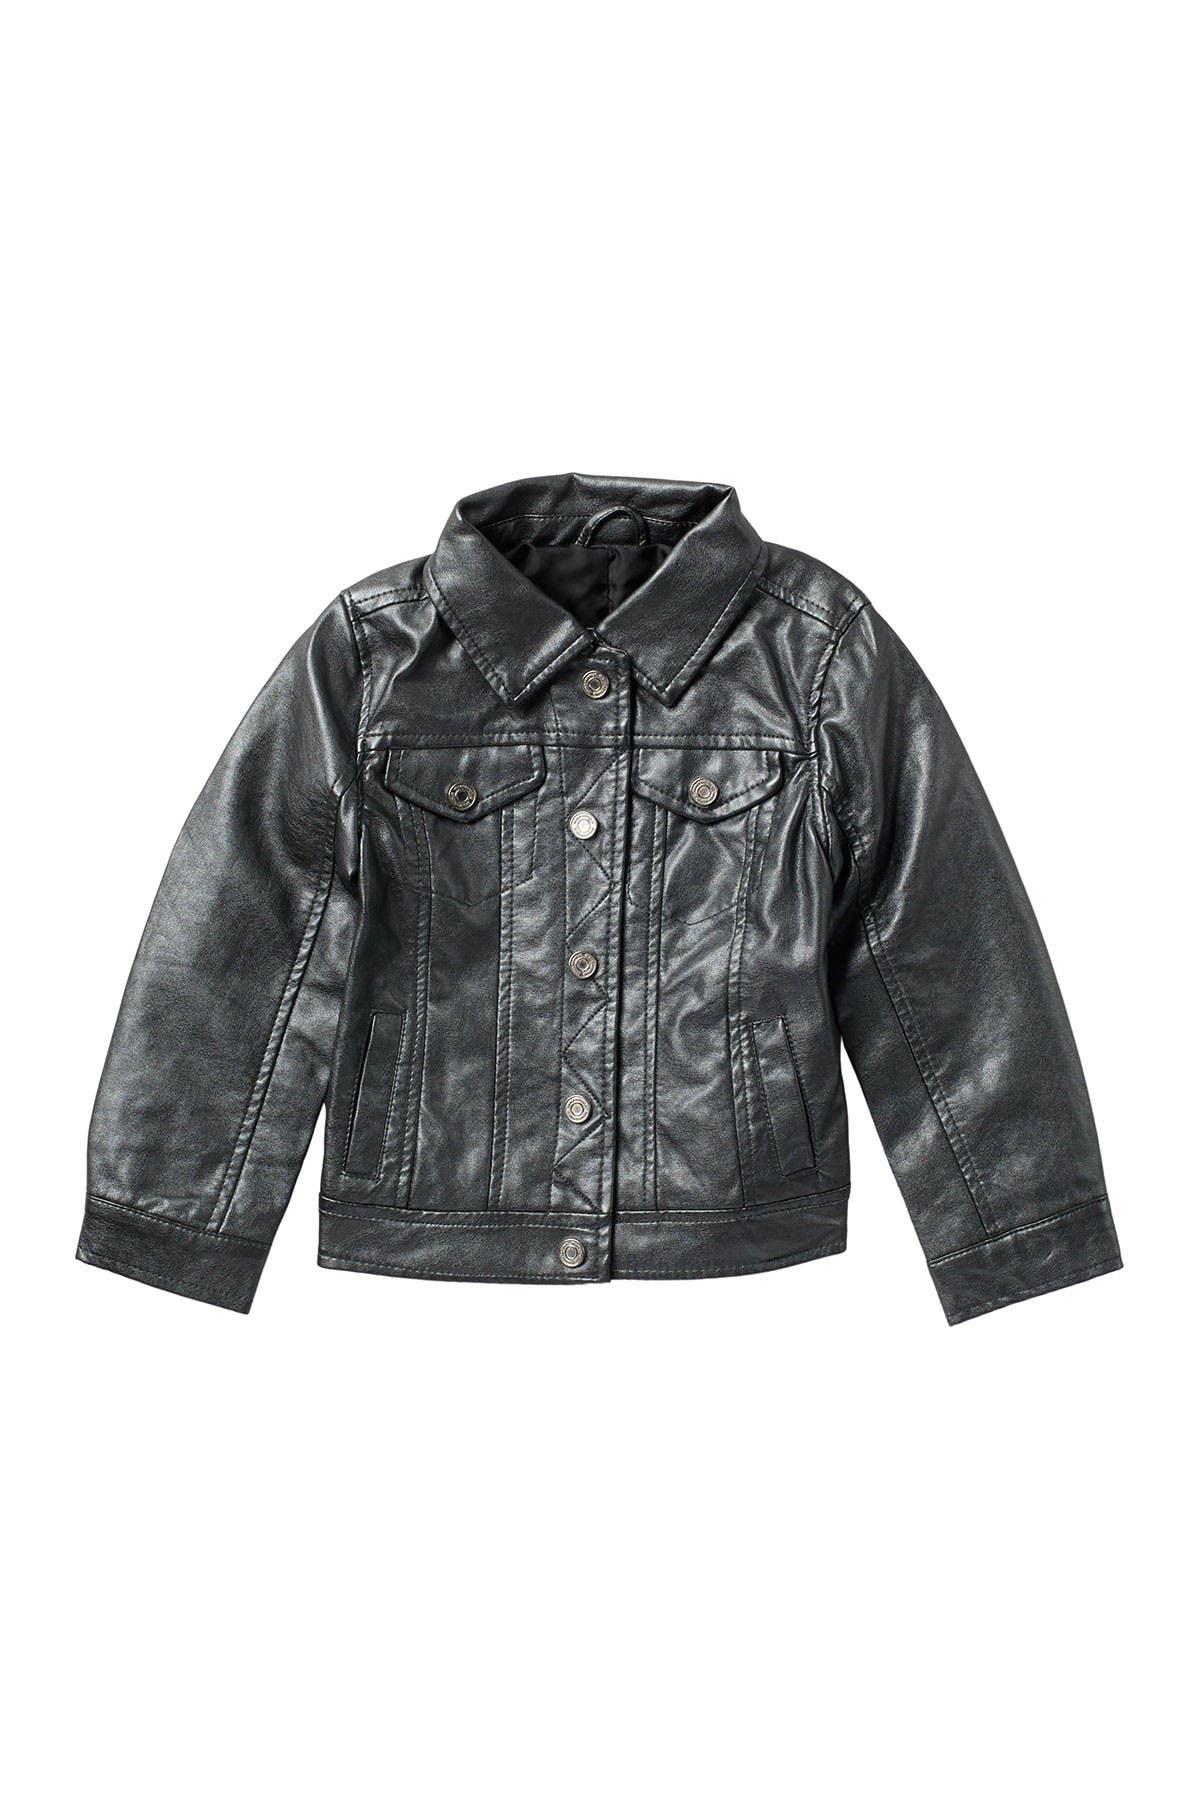 Urban Republic Metallic Faux Leather Trucker Jacket